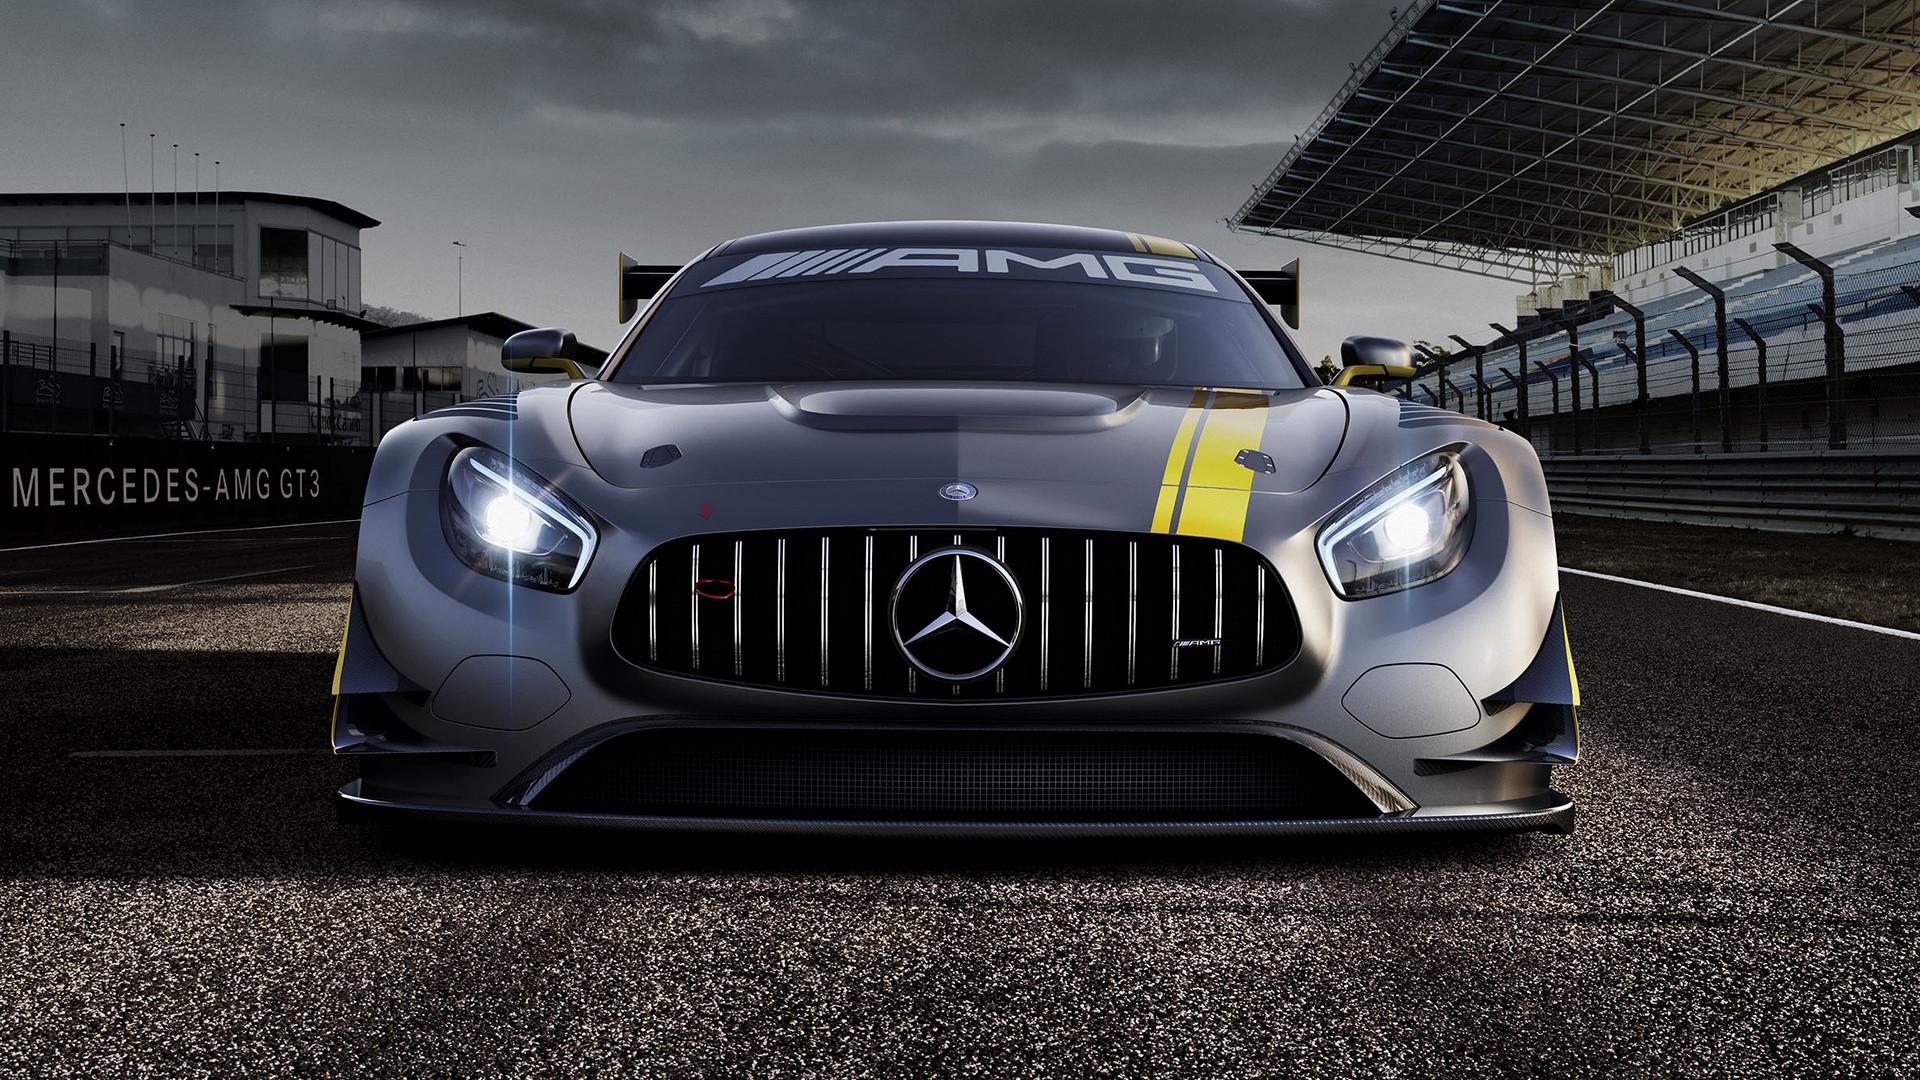 Car In Desert Hd Wallpaper Die 73 Besten Mercedes Wallpapers